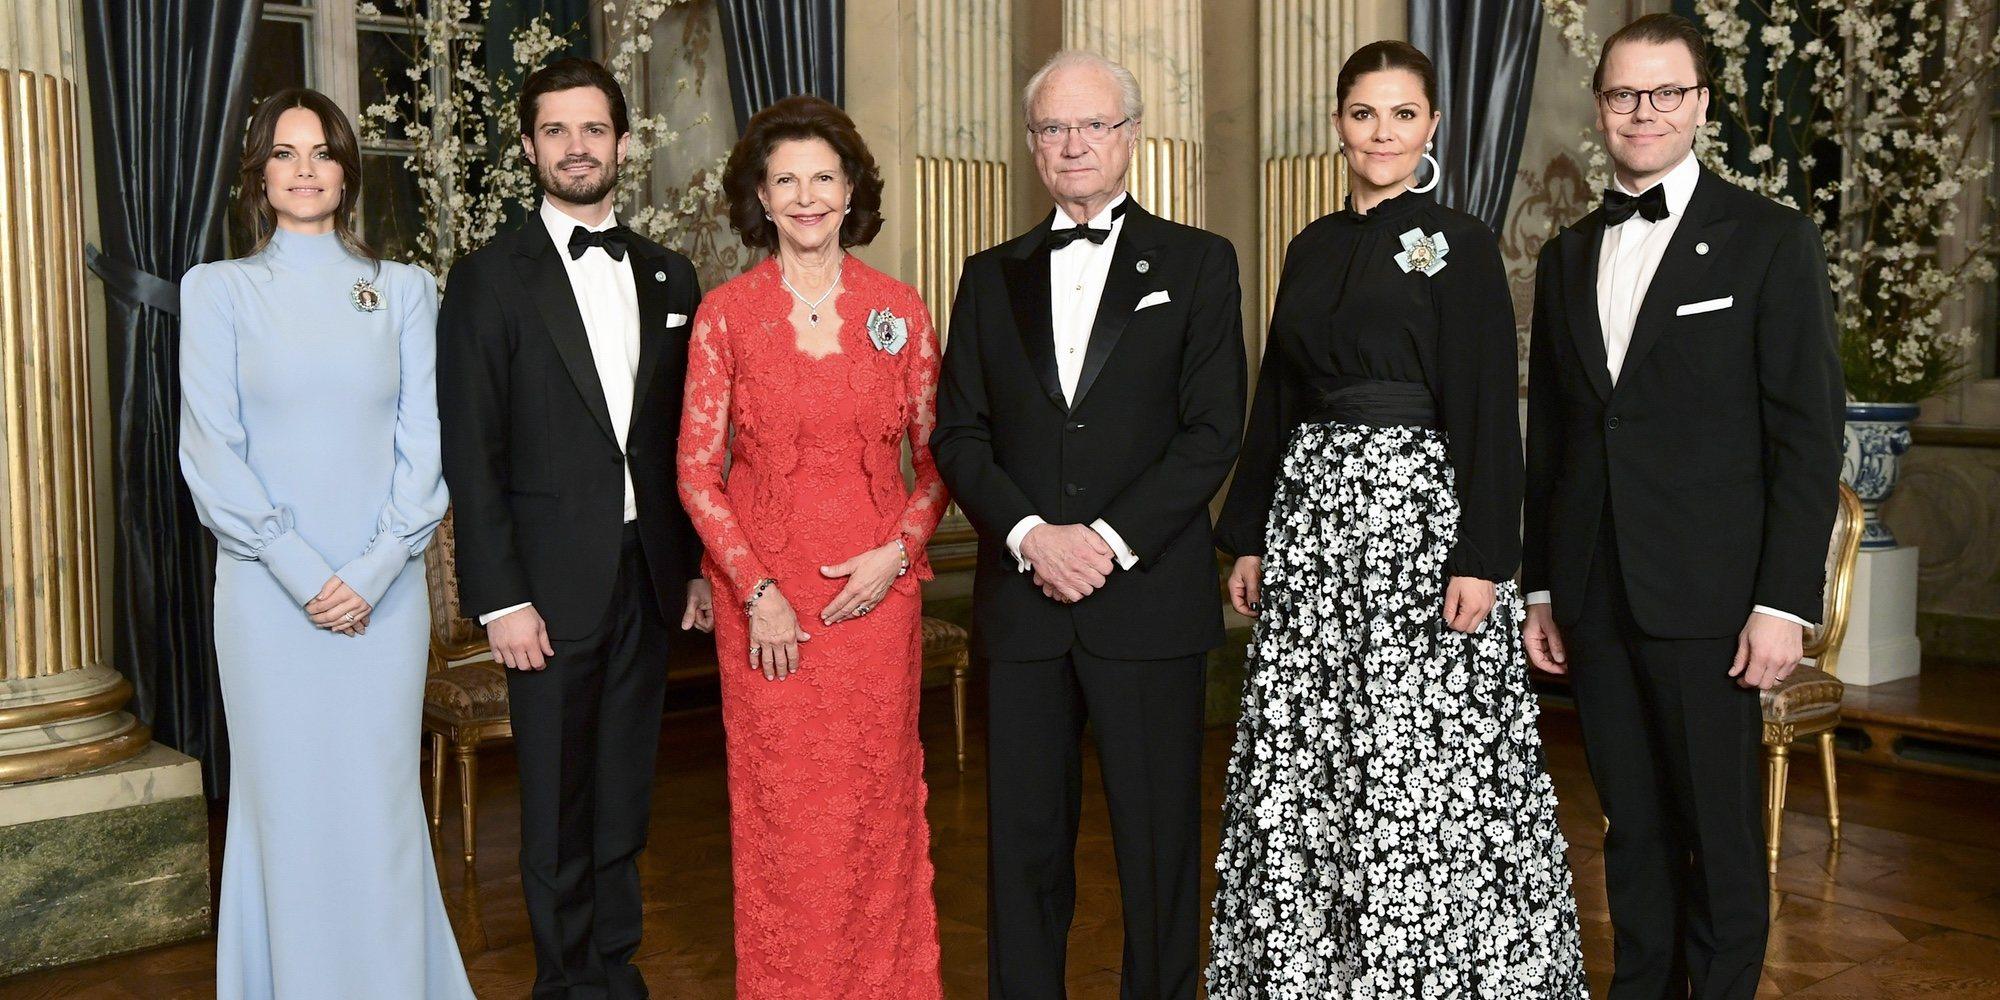 La Familia Real Sueca se ve obligada a cancelar una cena de gala a causa del Coronavirus